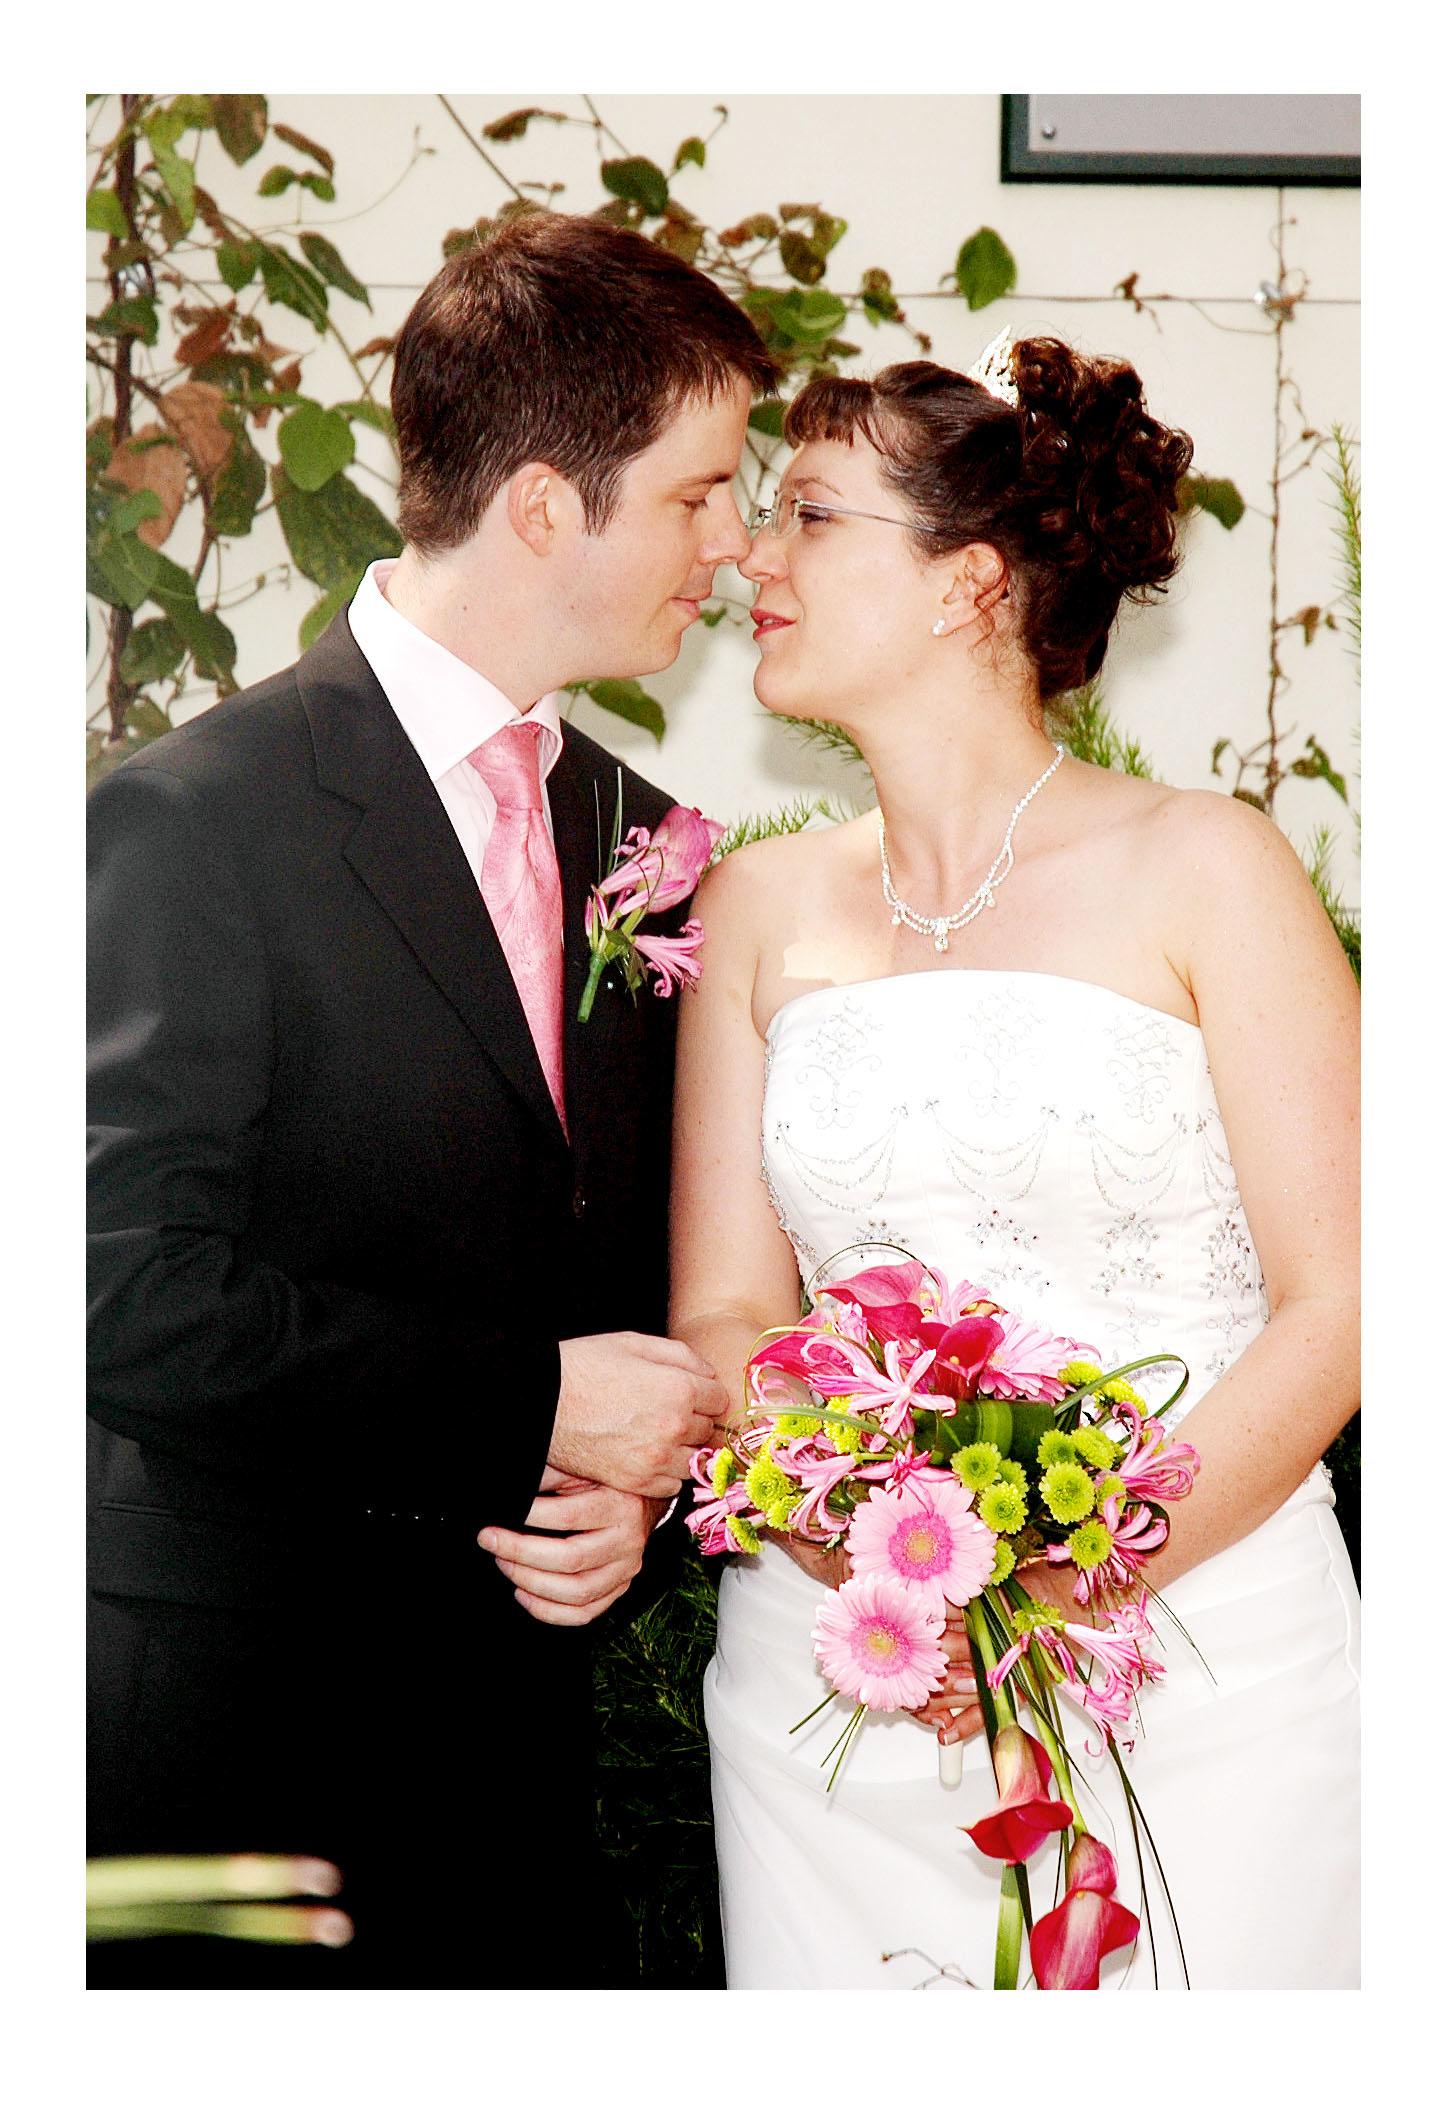 REPORTAGE-WEDDING-PHOTOGRAPHY-SET-UK-10.jpg